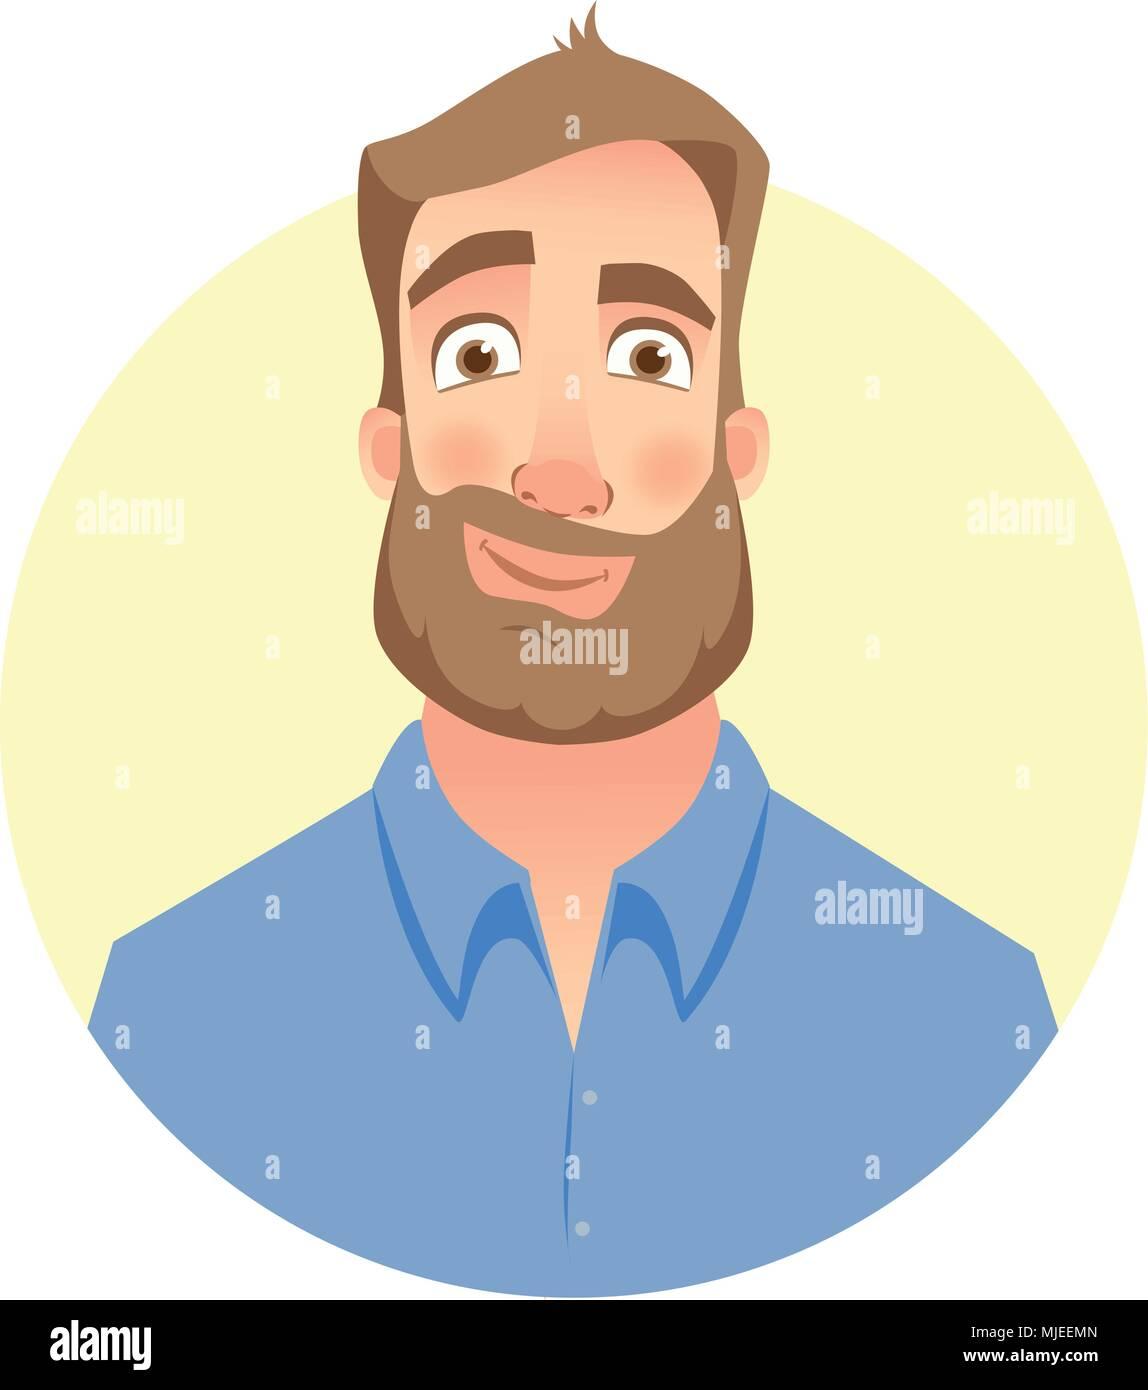 Face of man with beard - Stock Vector